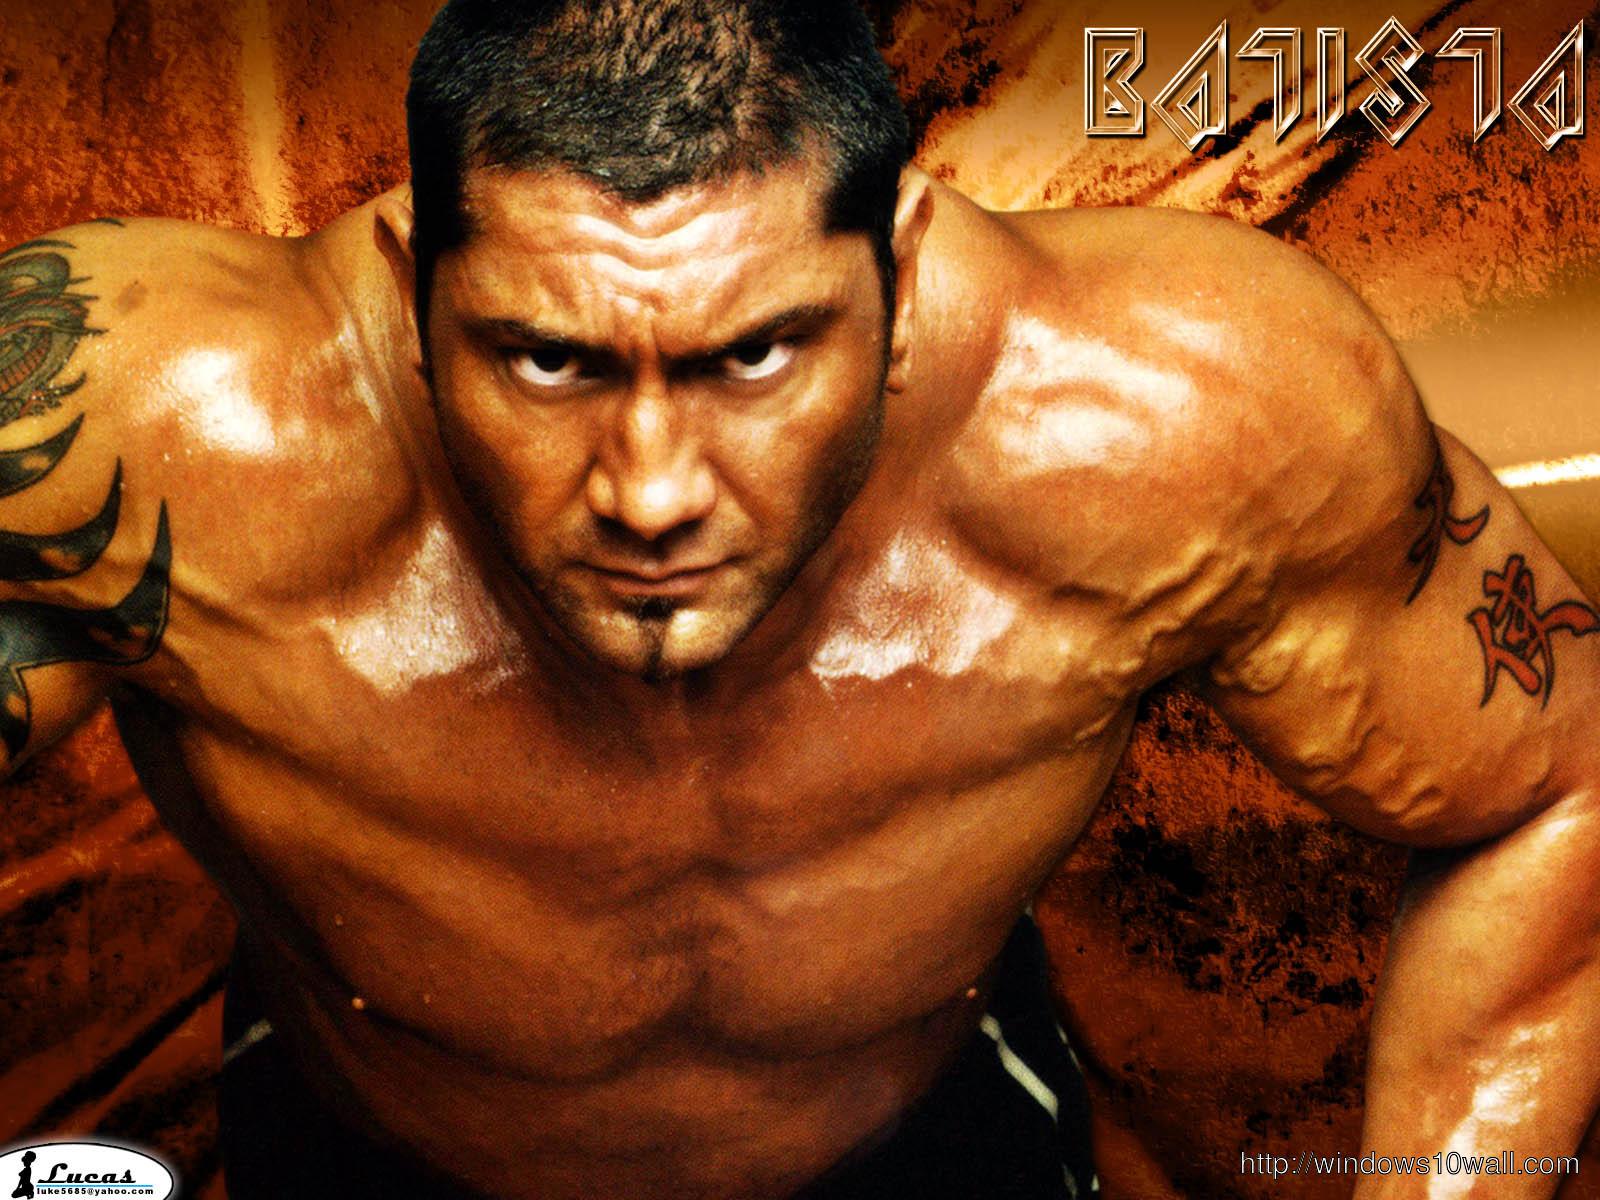 Batista Wrestling Wallpaper